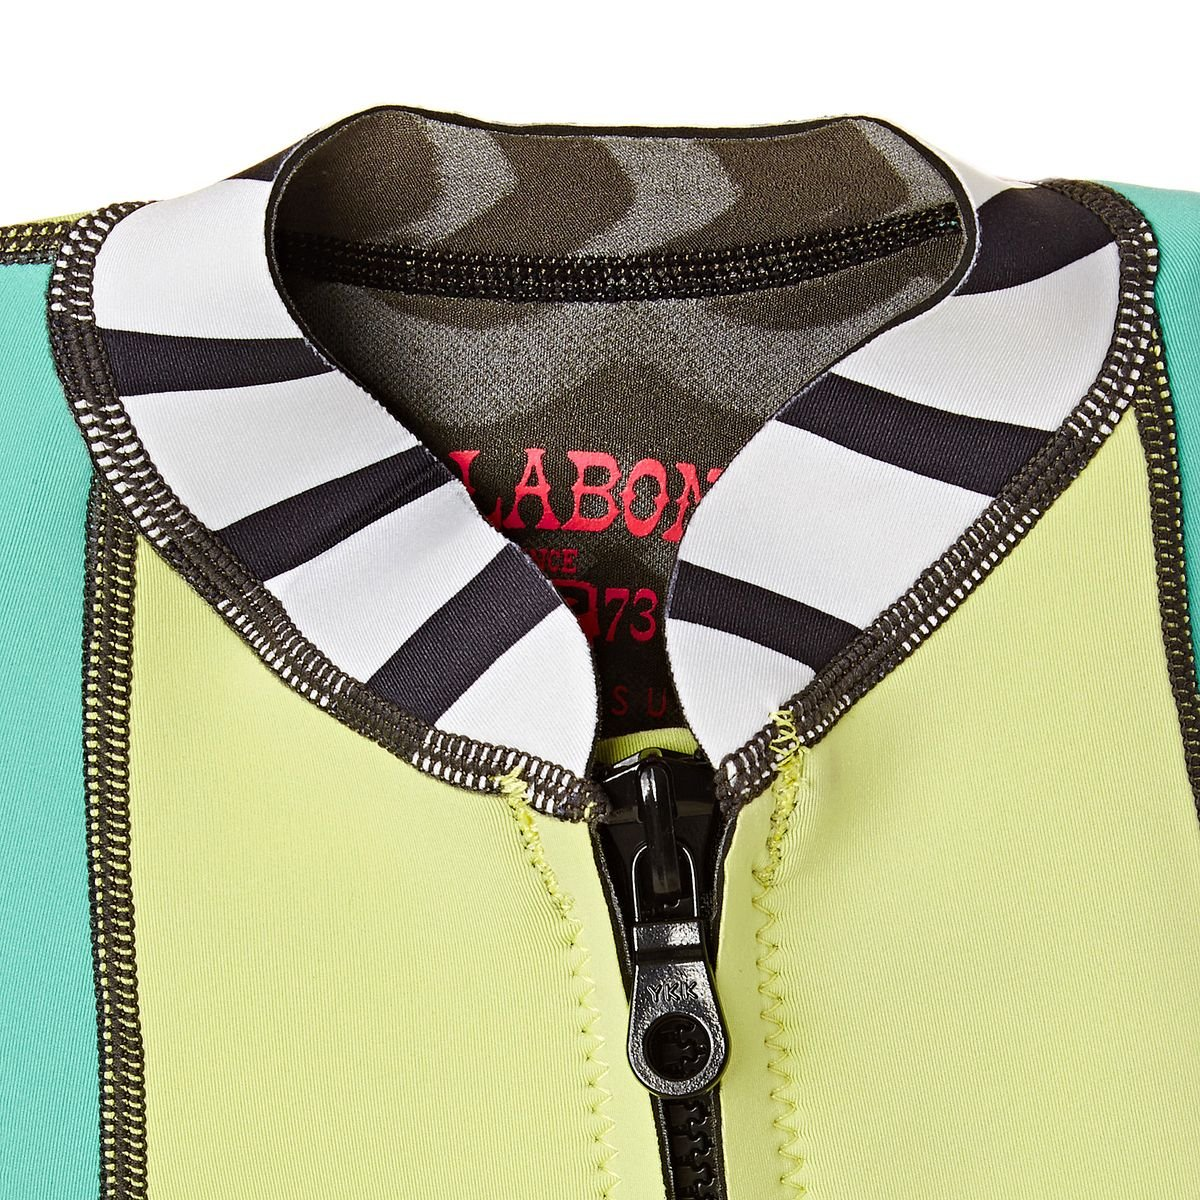 Amazon.com   Billabong Salty DayZ 1MM Neoprene Wetsuit Vest Top Aruba - Womens  Wetsuit Vest   Sports   Outdoors 1050e6957